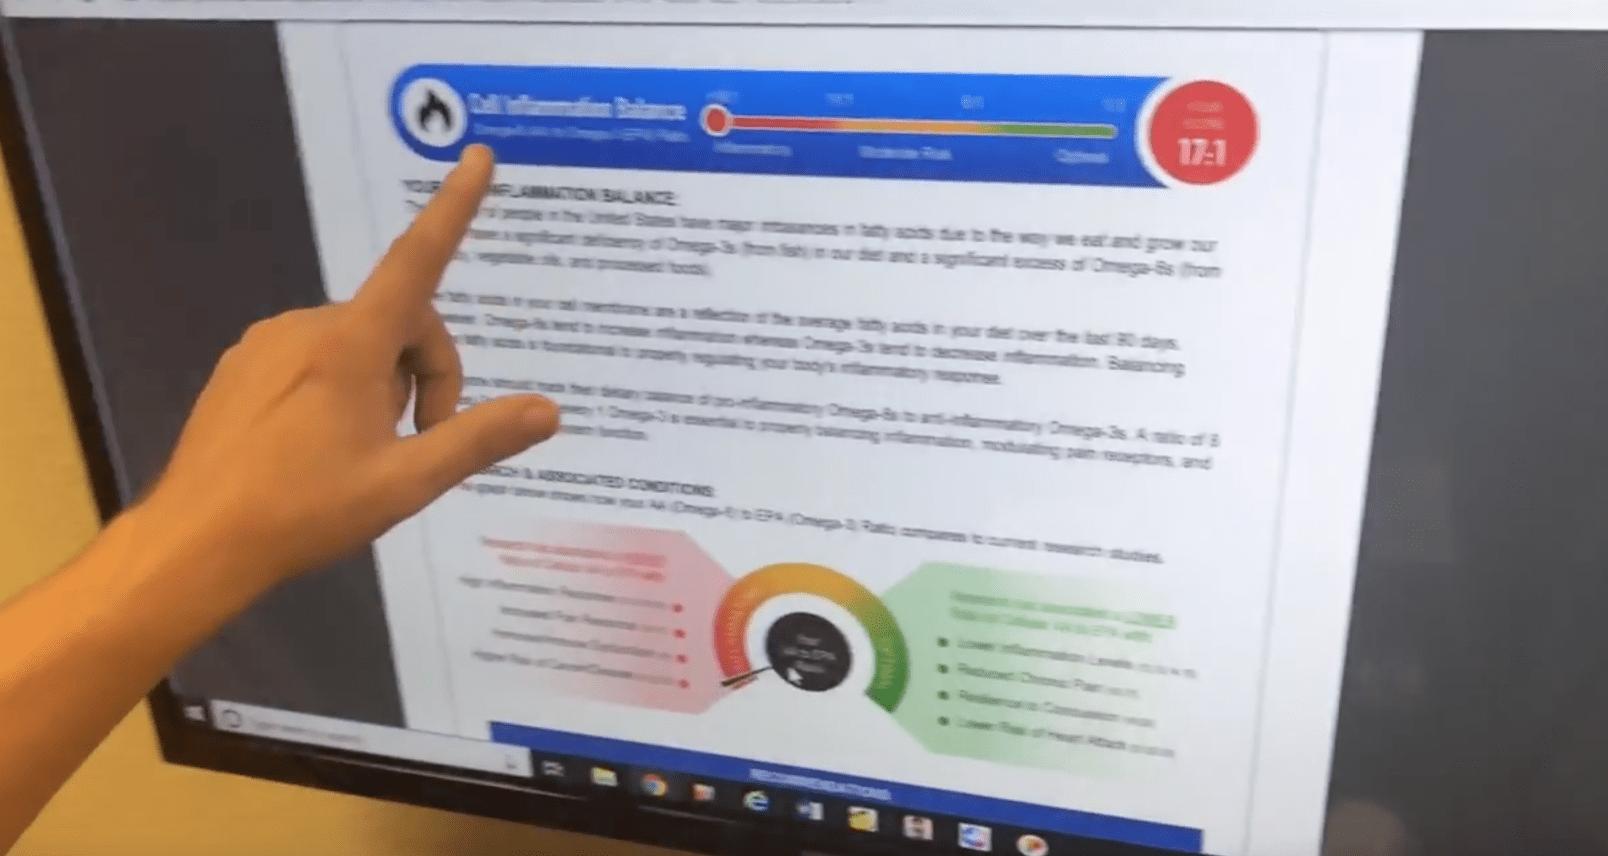 Powerful Predictive Concussion Test